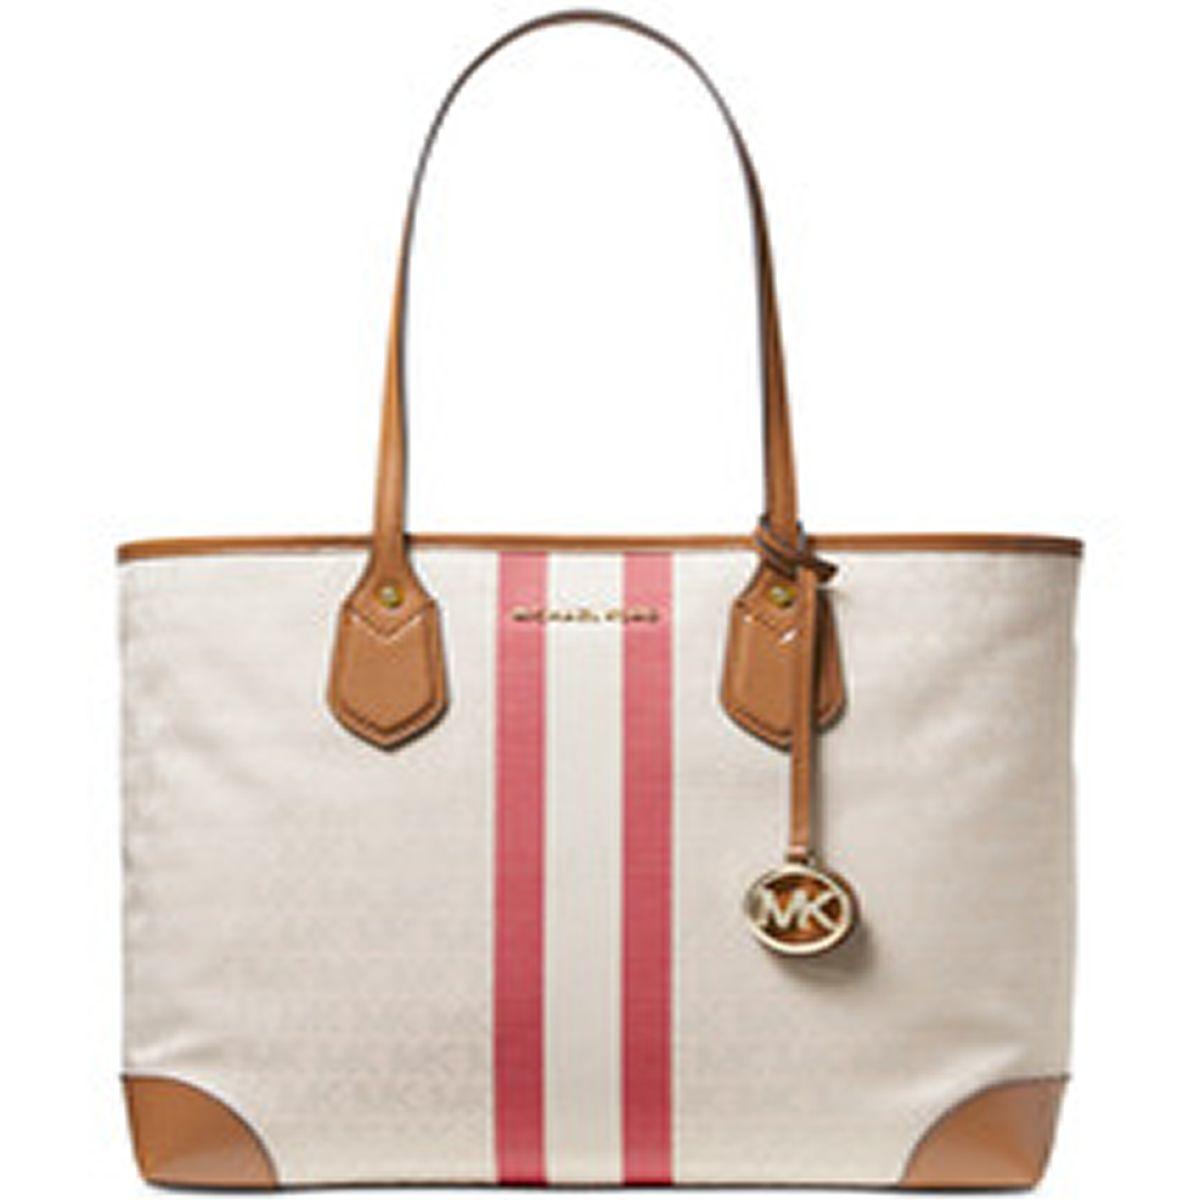 fc1a93fbaf26 Michael Kors Tote Bags - Macy's